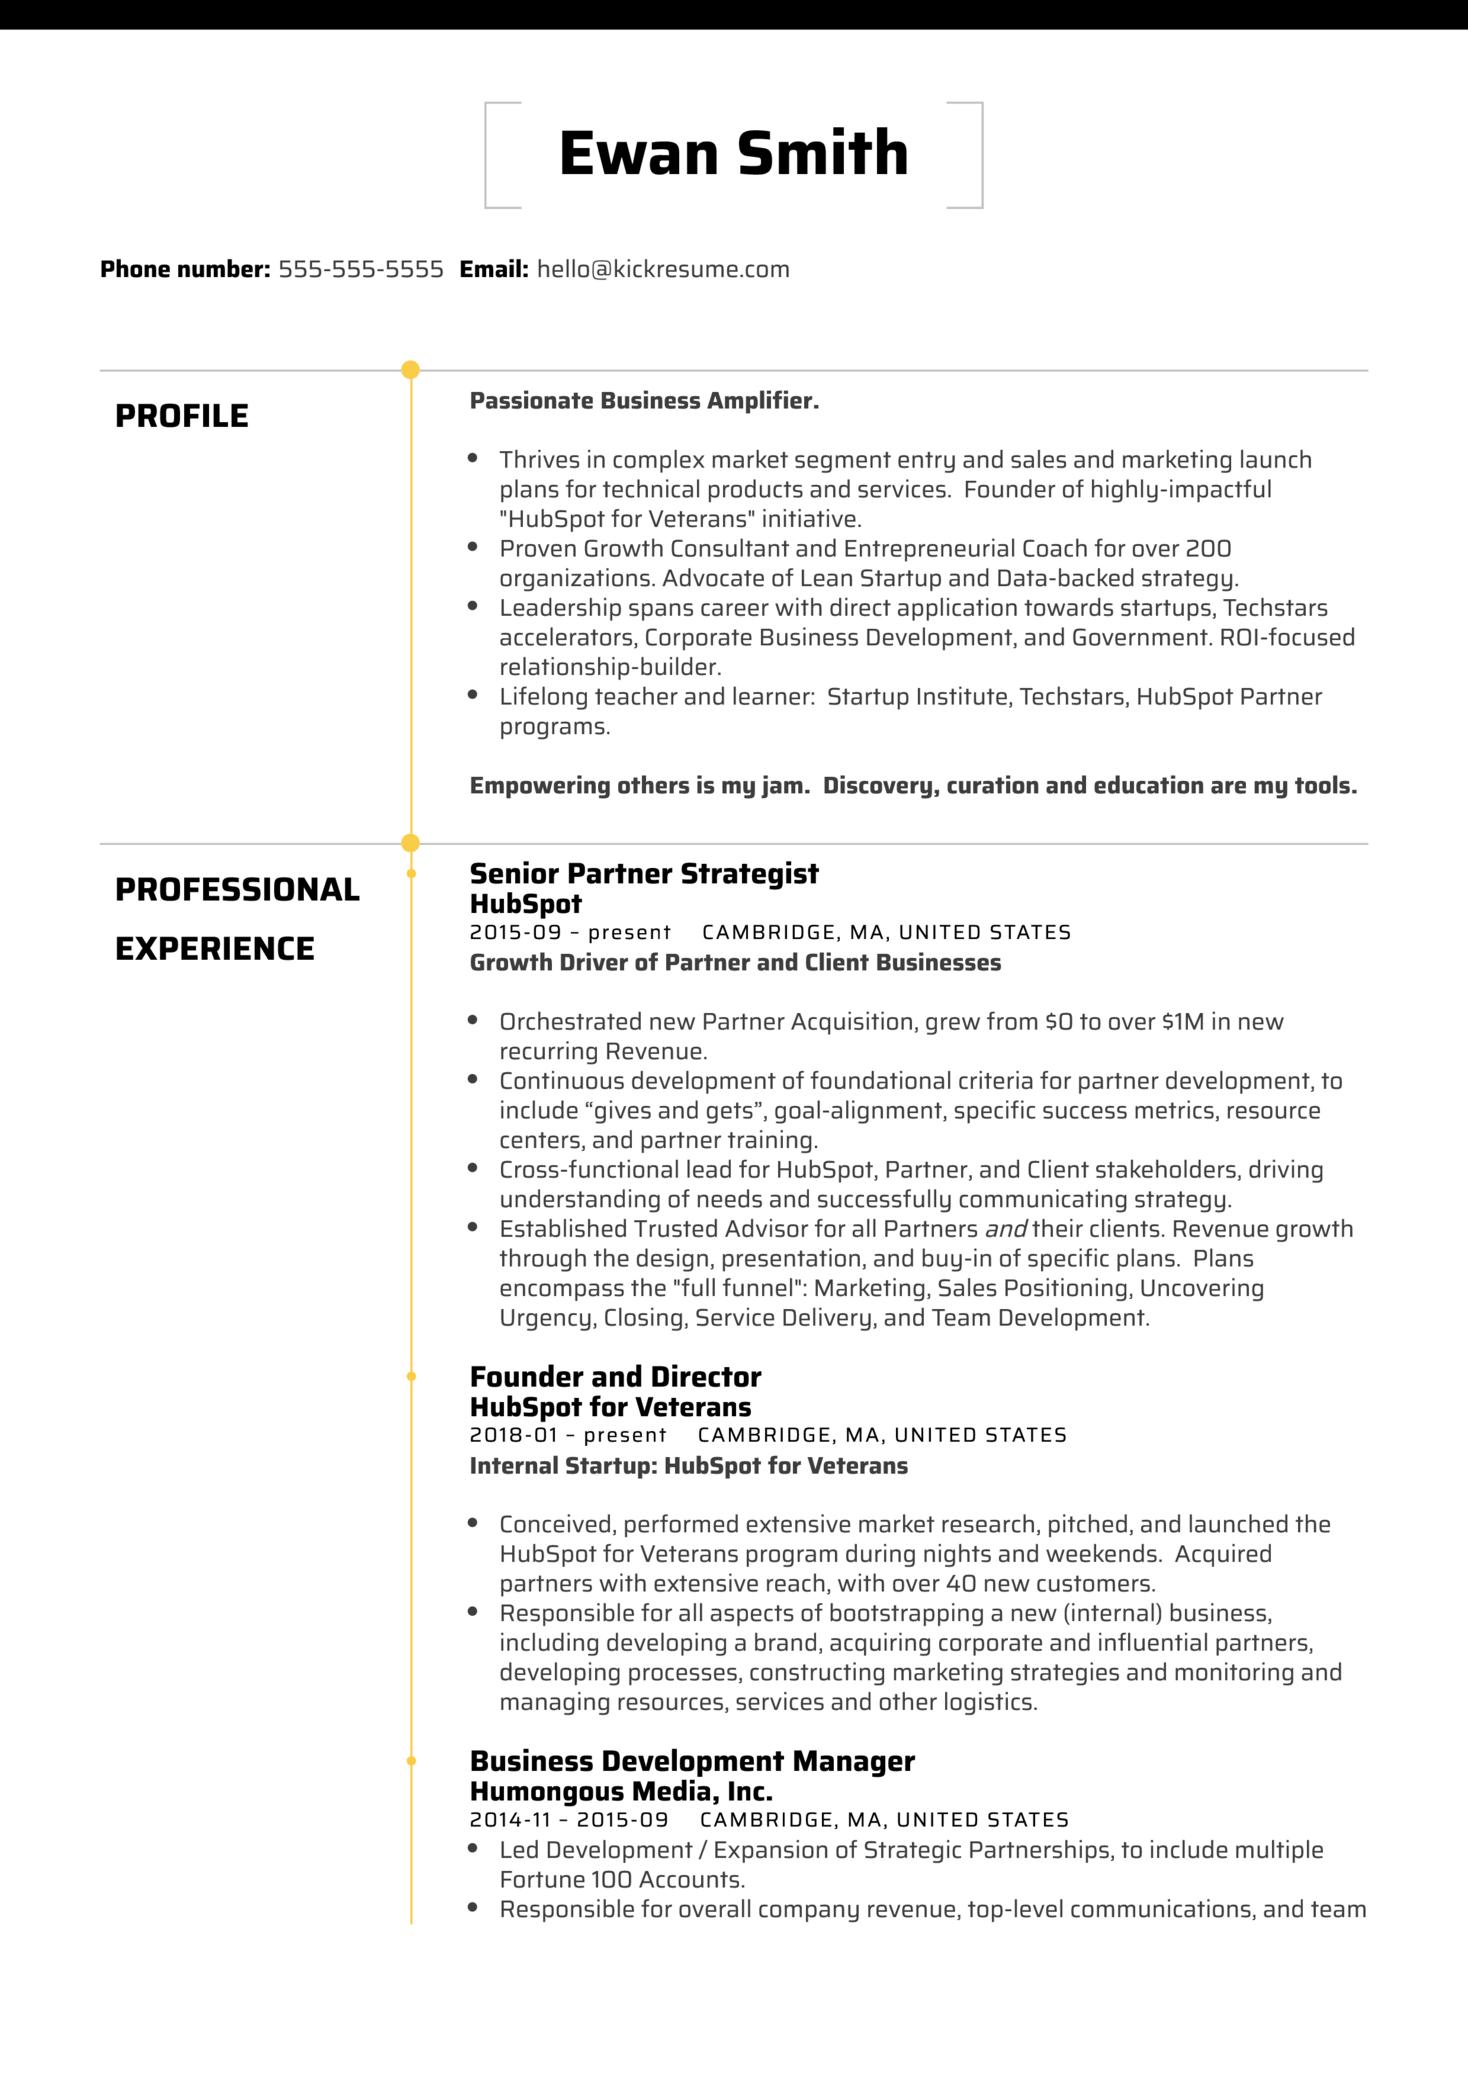 HubSpot Director of Business Development Resume Sample (parte 1)